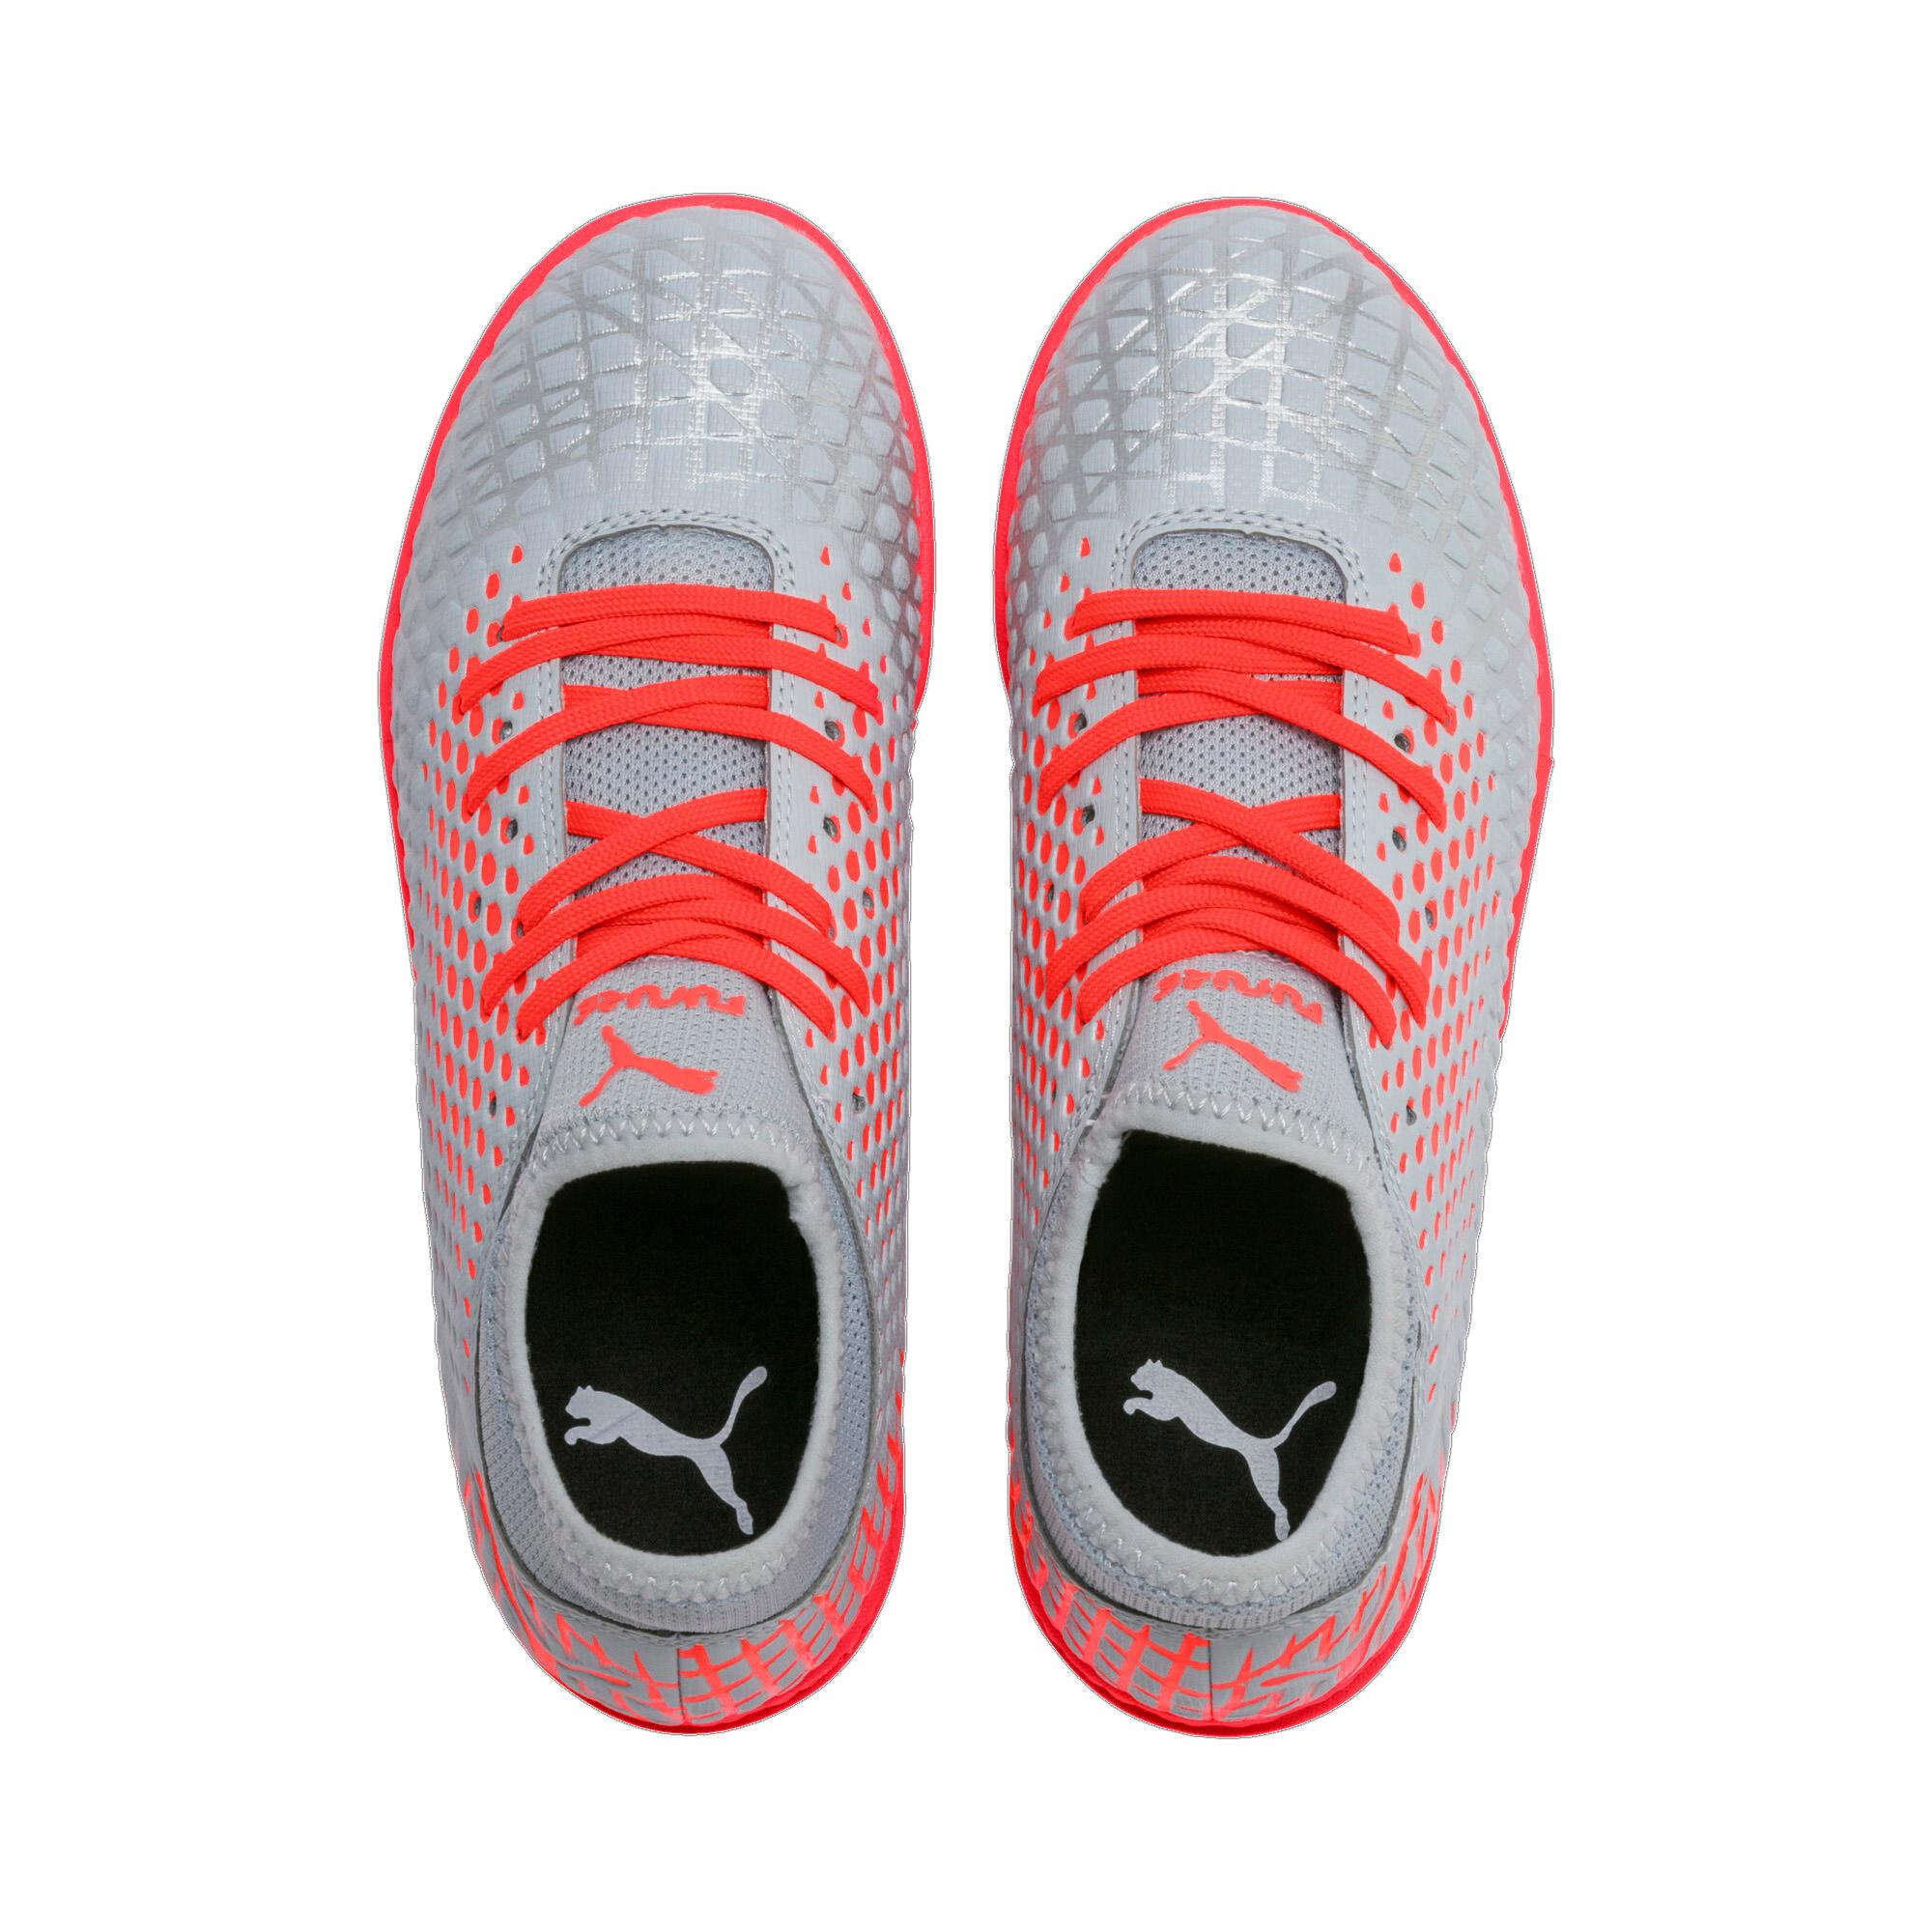 Thumbnail 6 of FUTURE 4.4 TT Soccer Shoes JR, Glacial Blue-Nrgy Red, medium